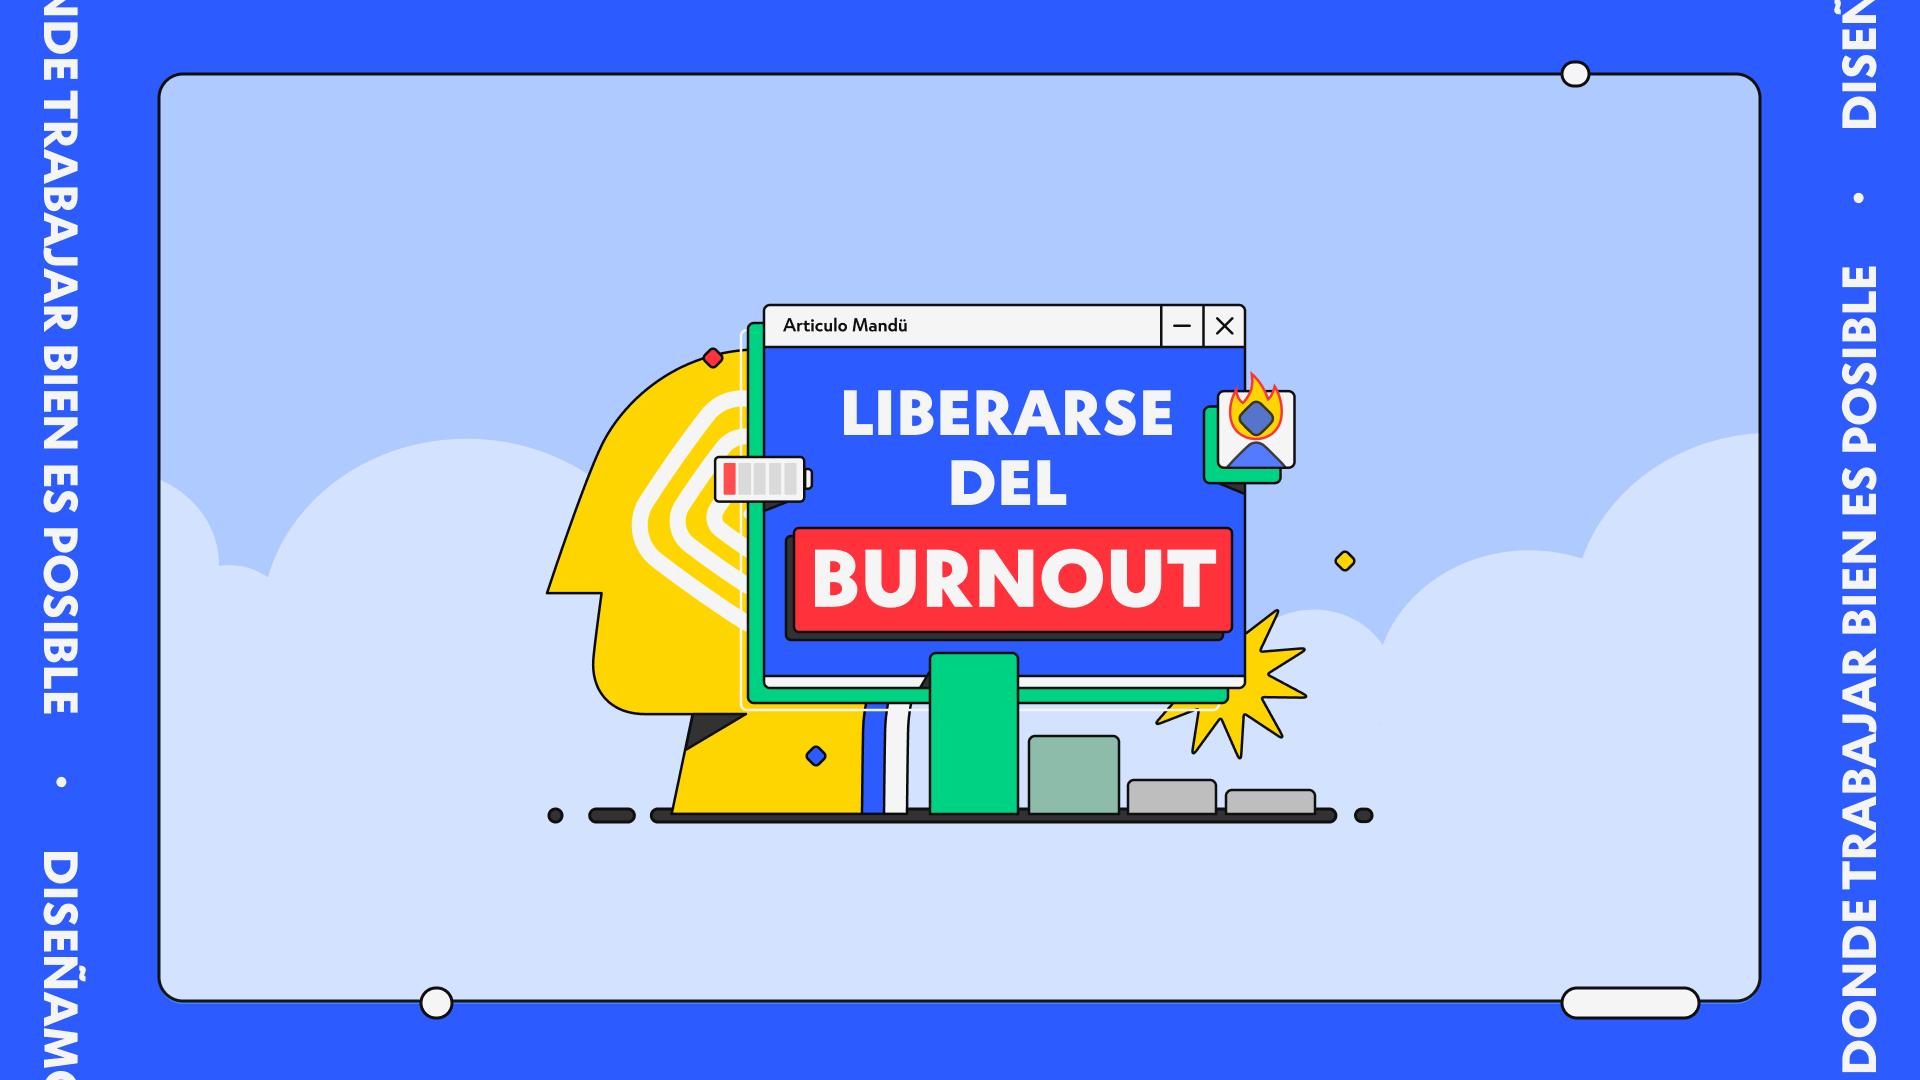 Liberarse del burnout